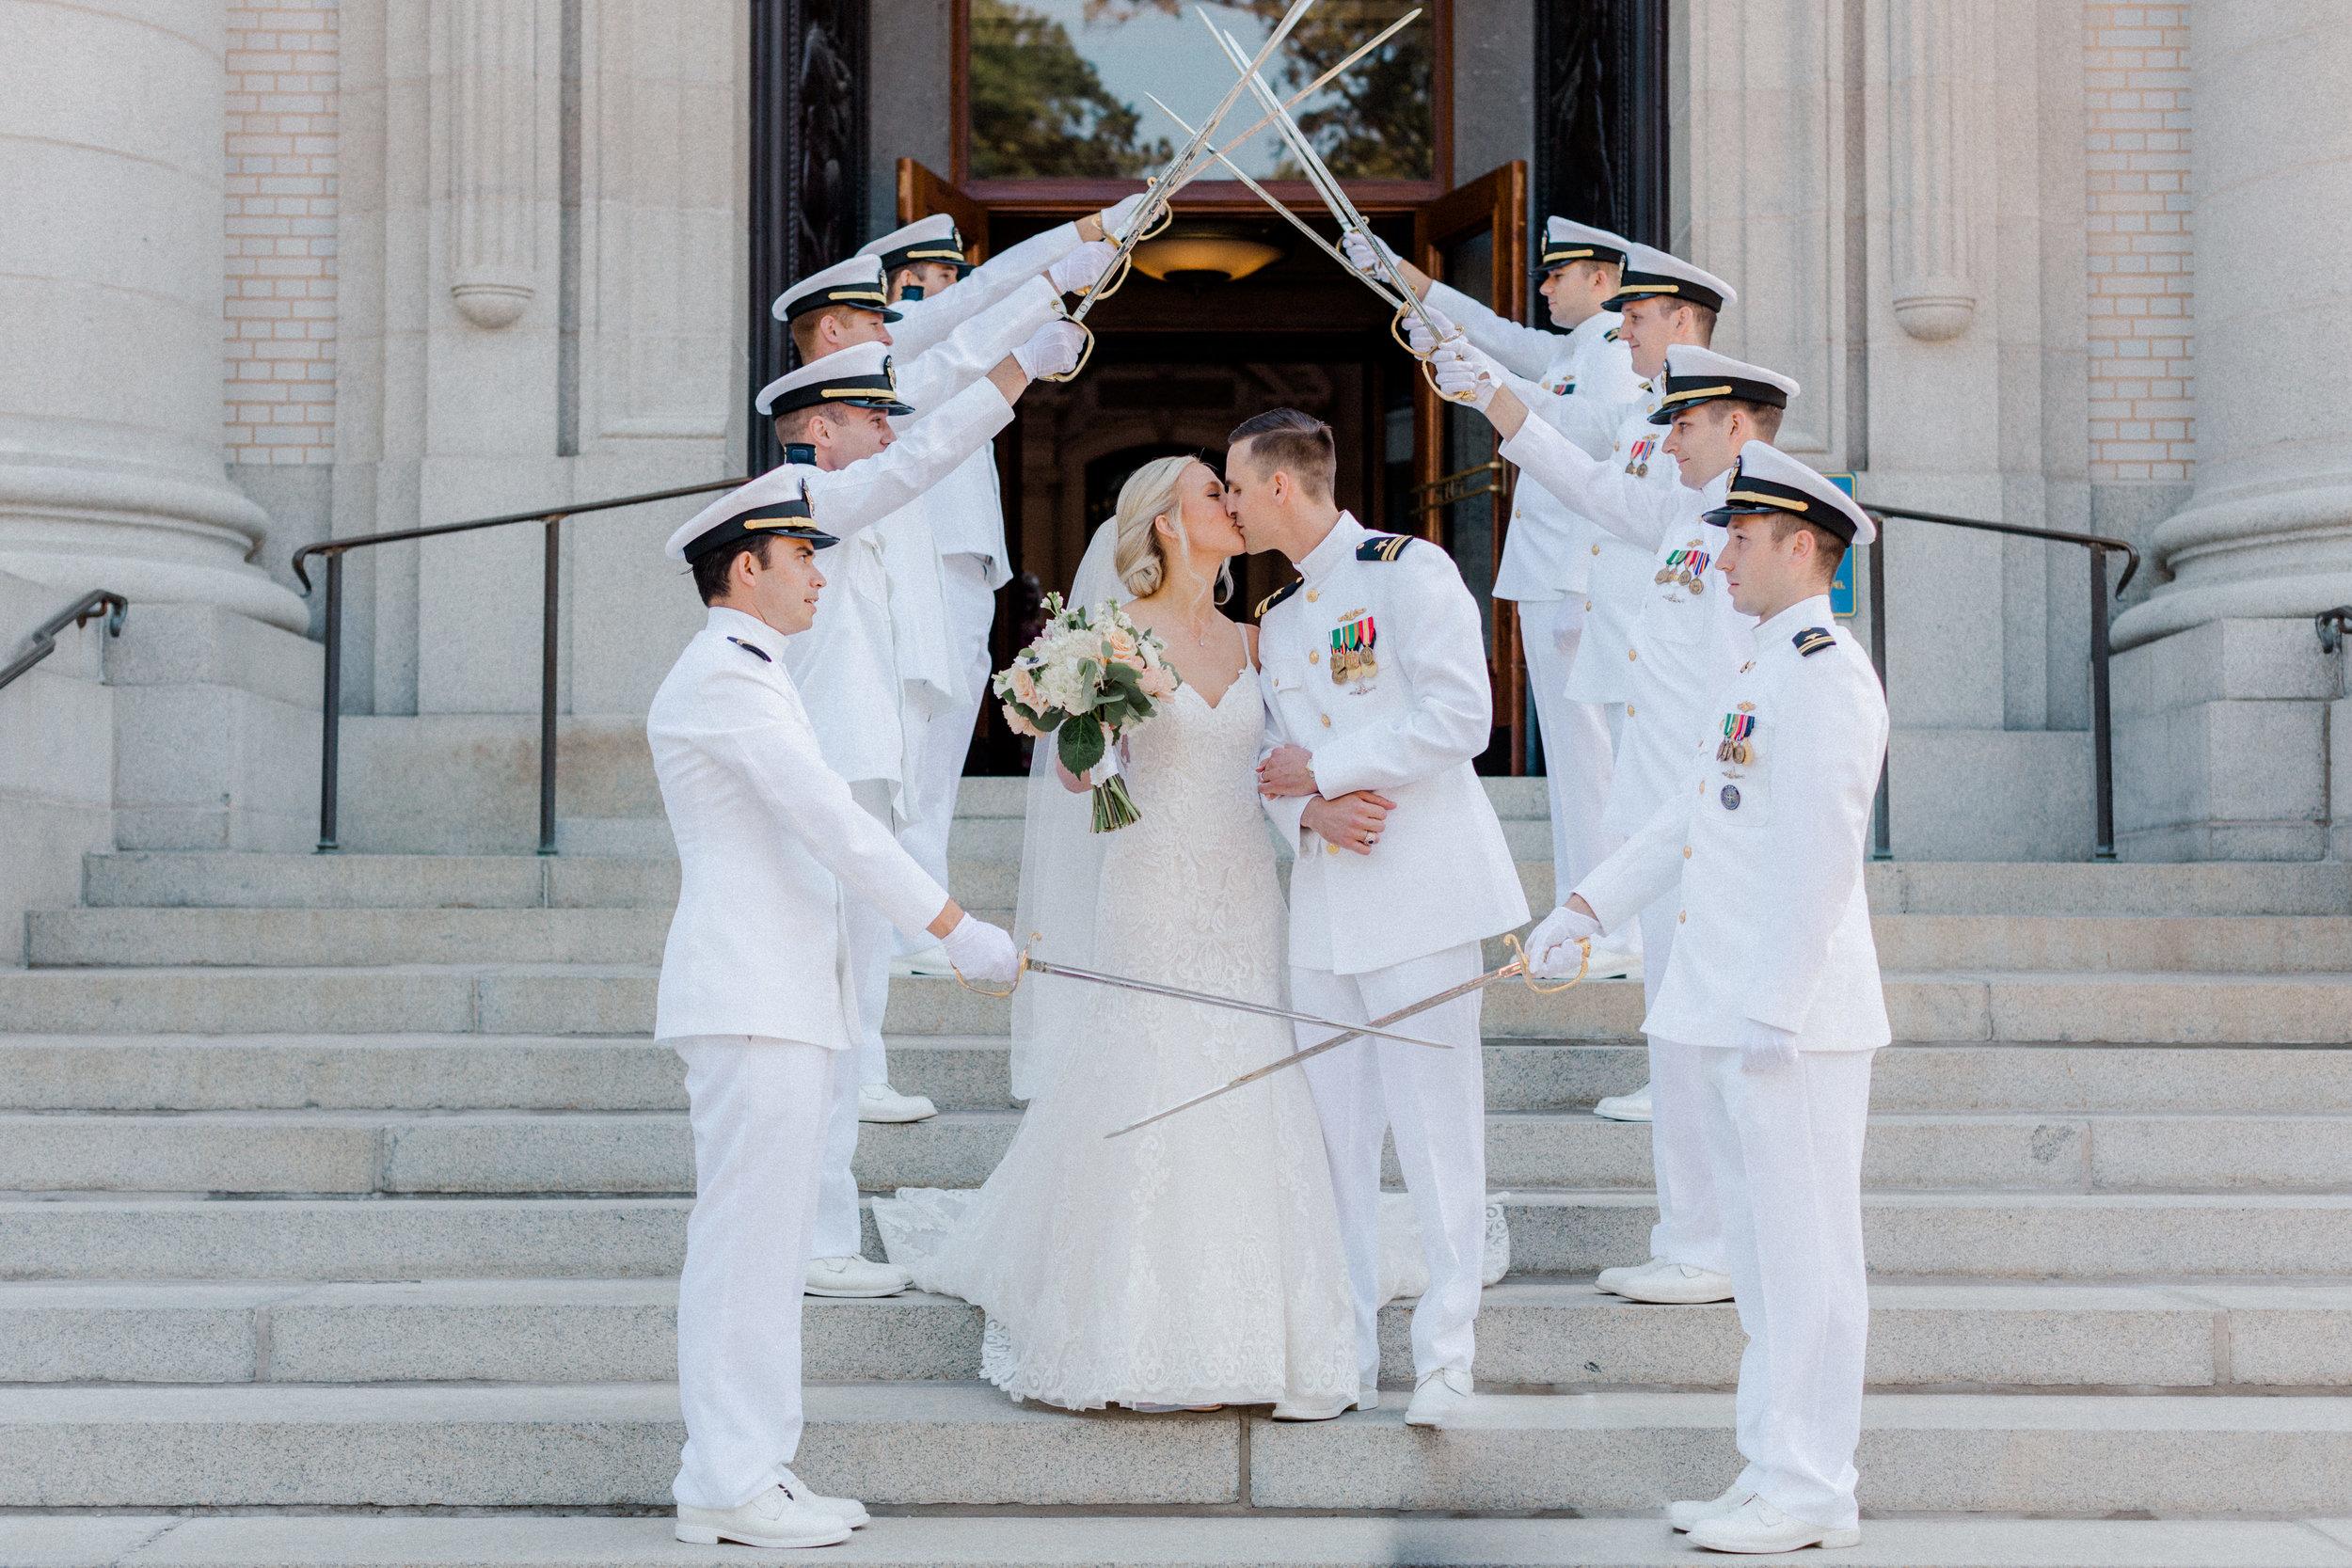 annapolis-wedding-photographer-hannah-lane-photography-1349.jpg